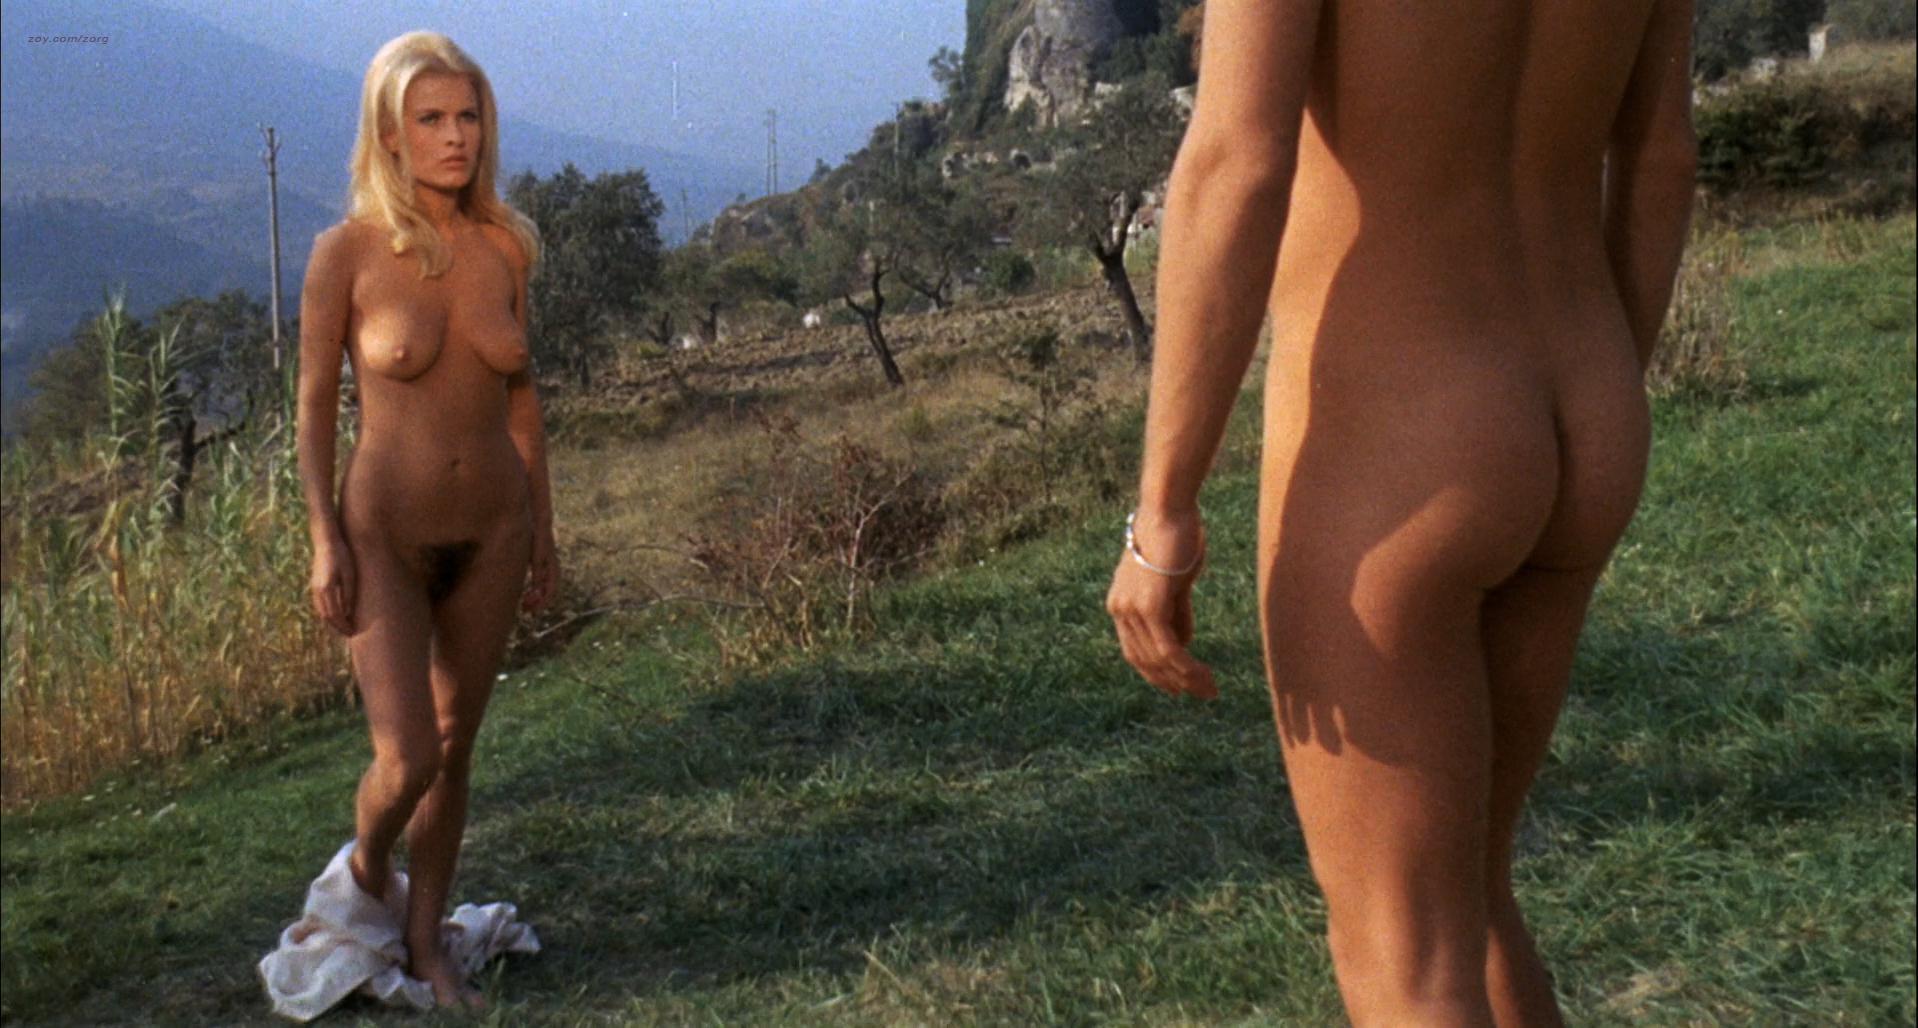 Silvana Venturelli nude, Erika Remberg nude - The Lickerish Quartet (1970)